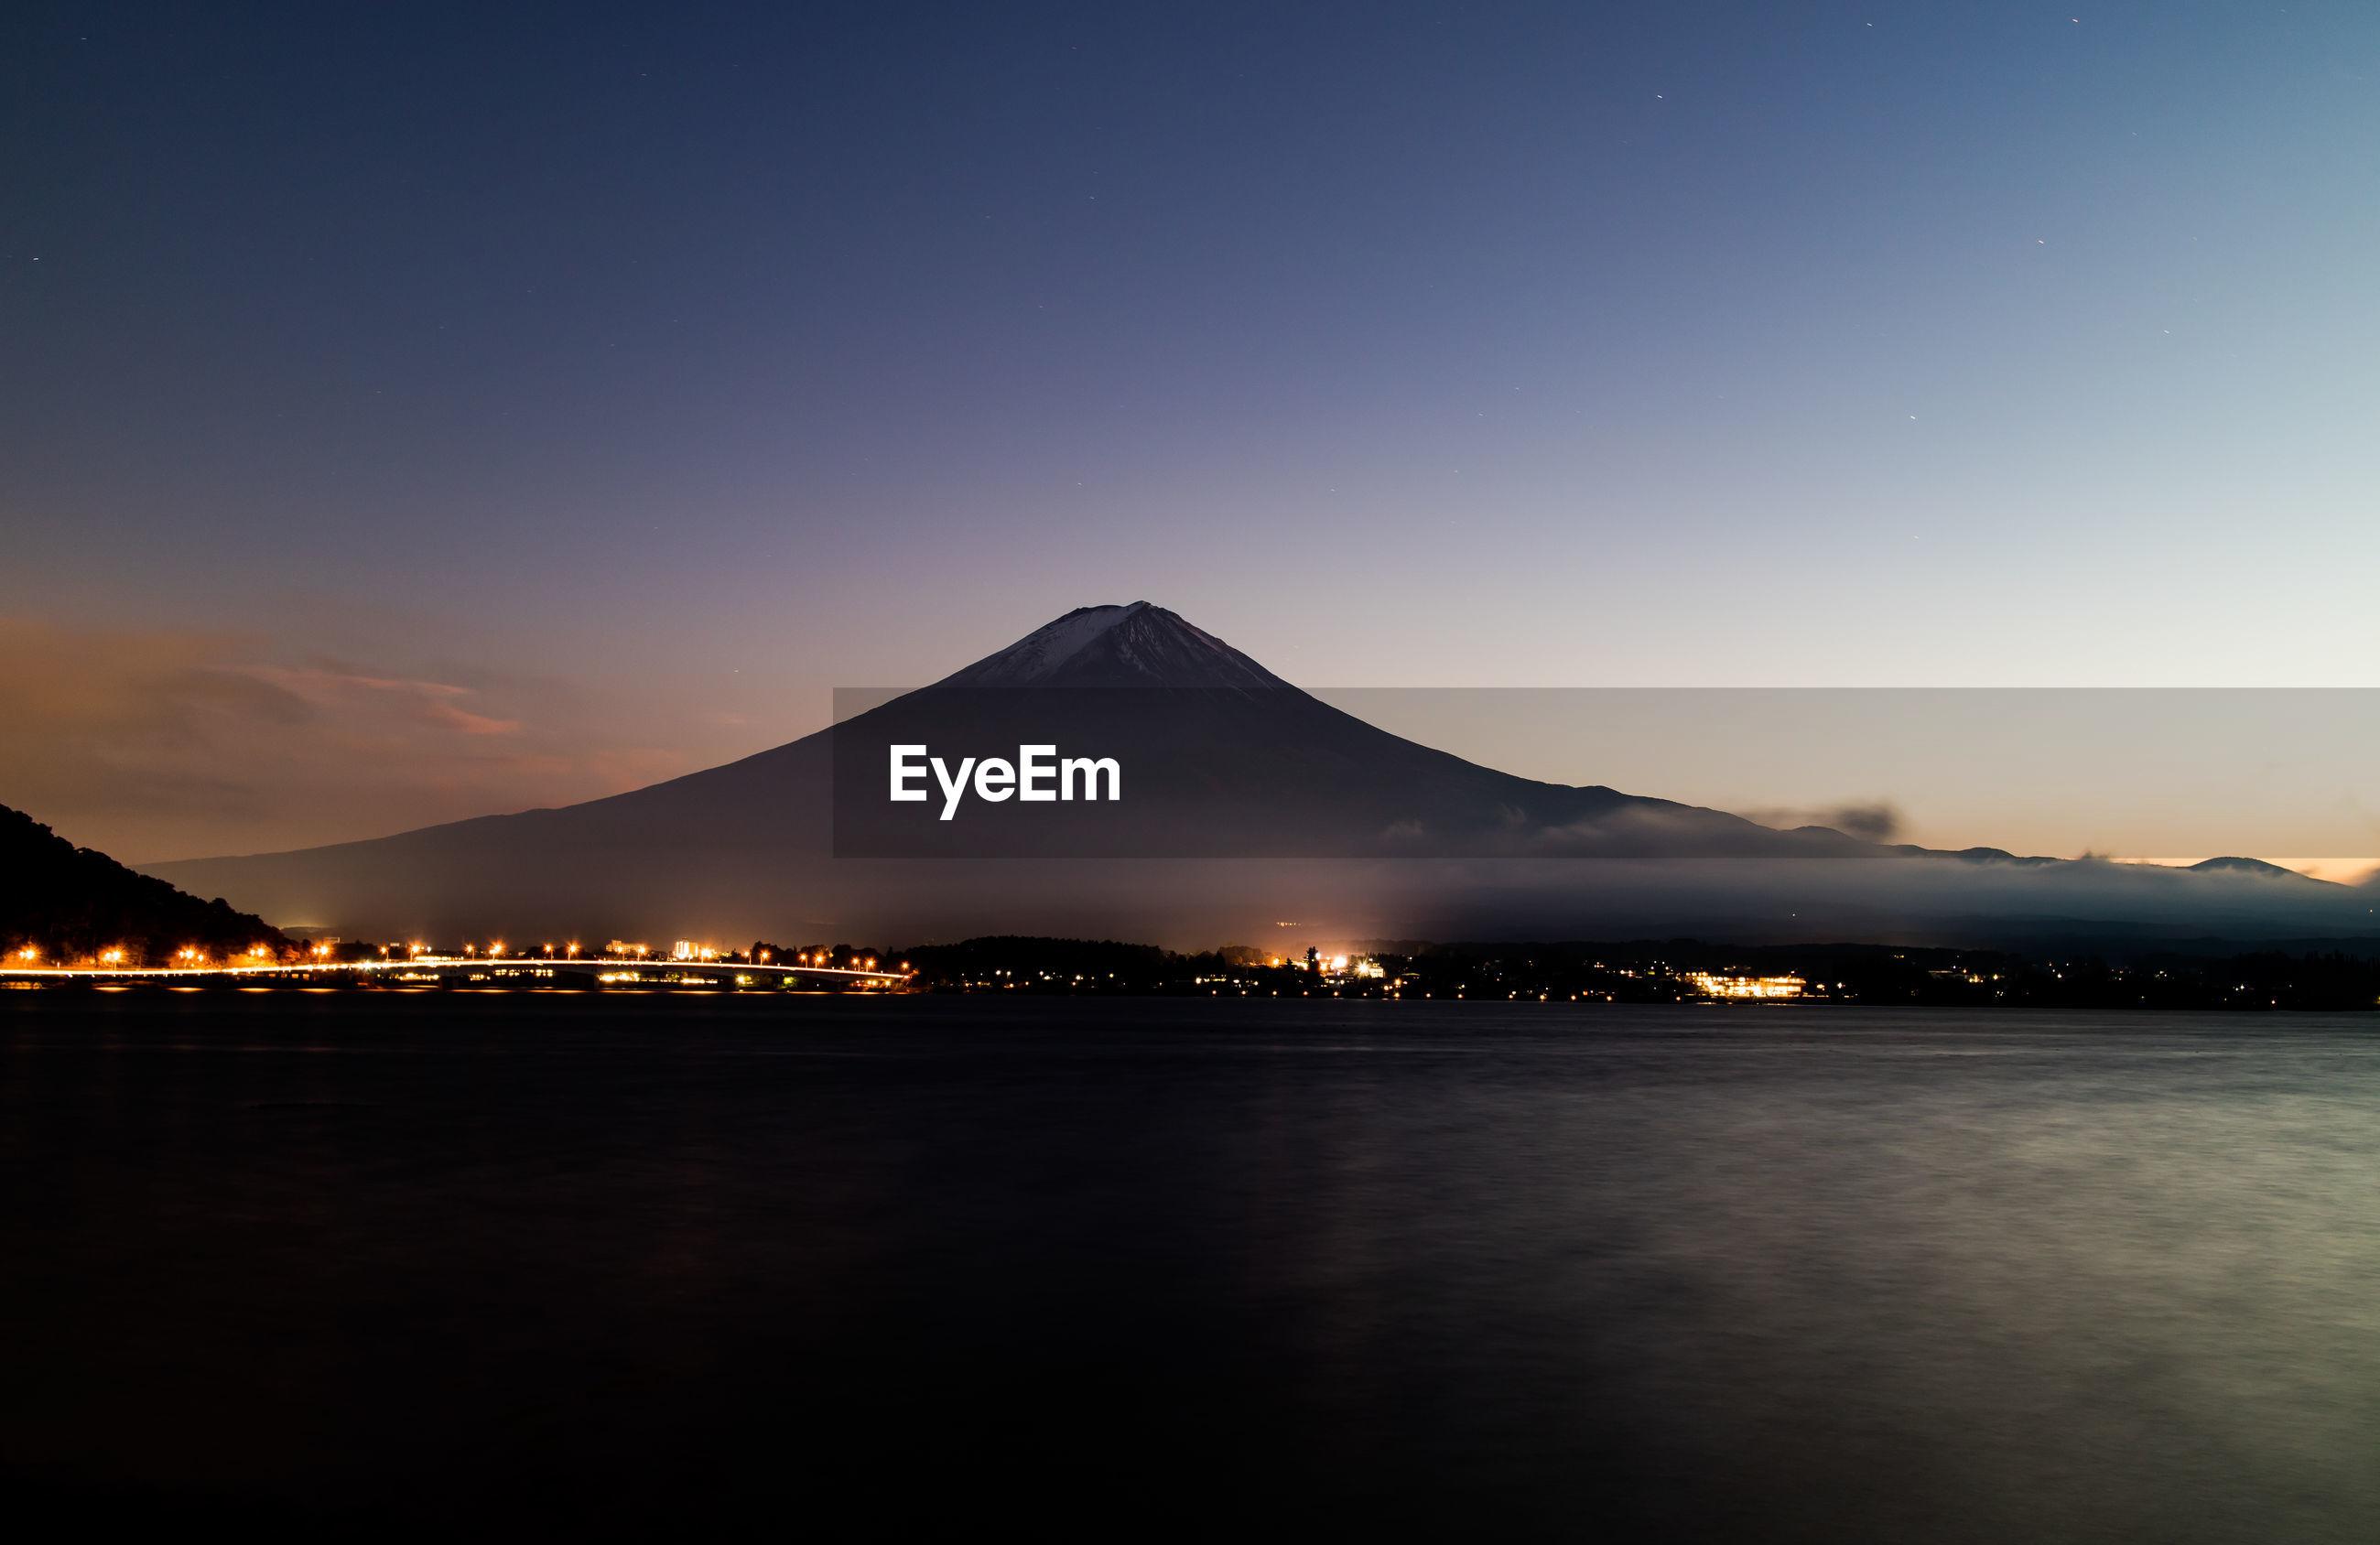 ILLUMINATED MOUNTAIN AGAINST SKY AT NIGHT